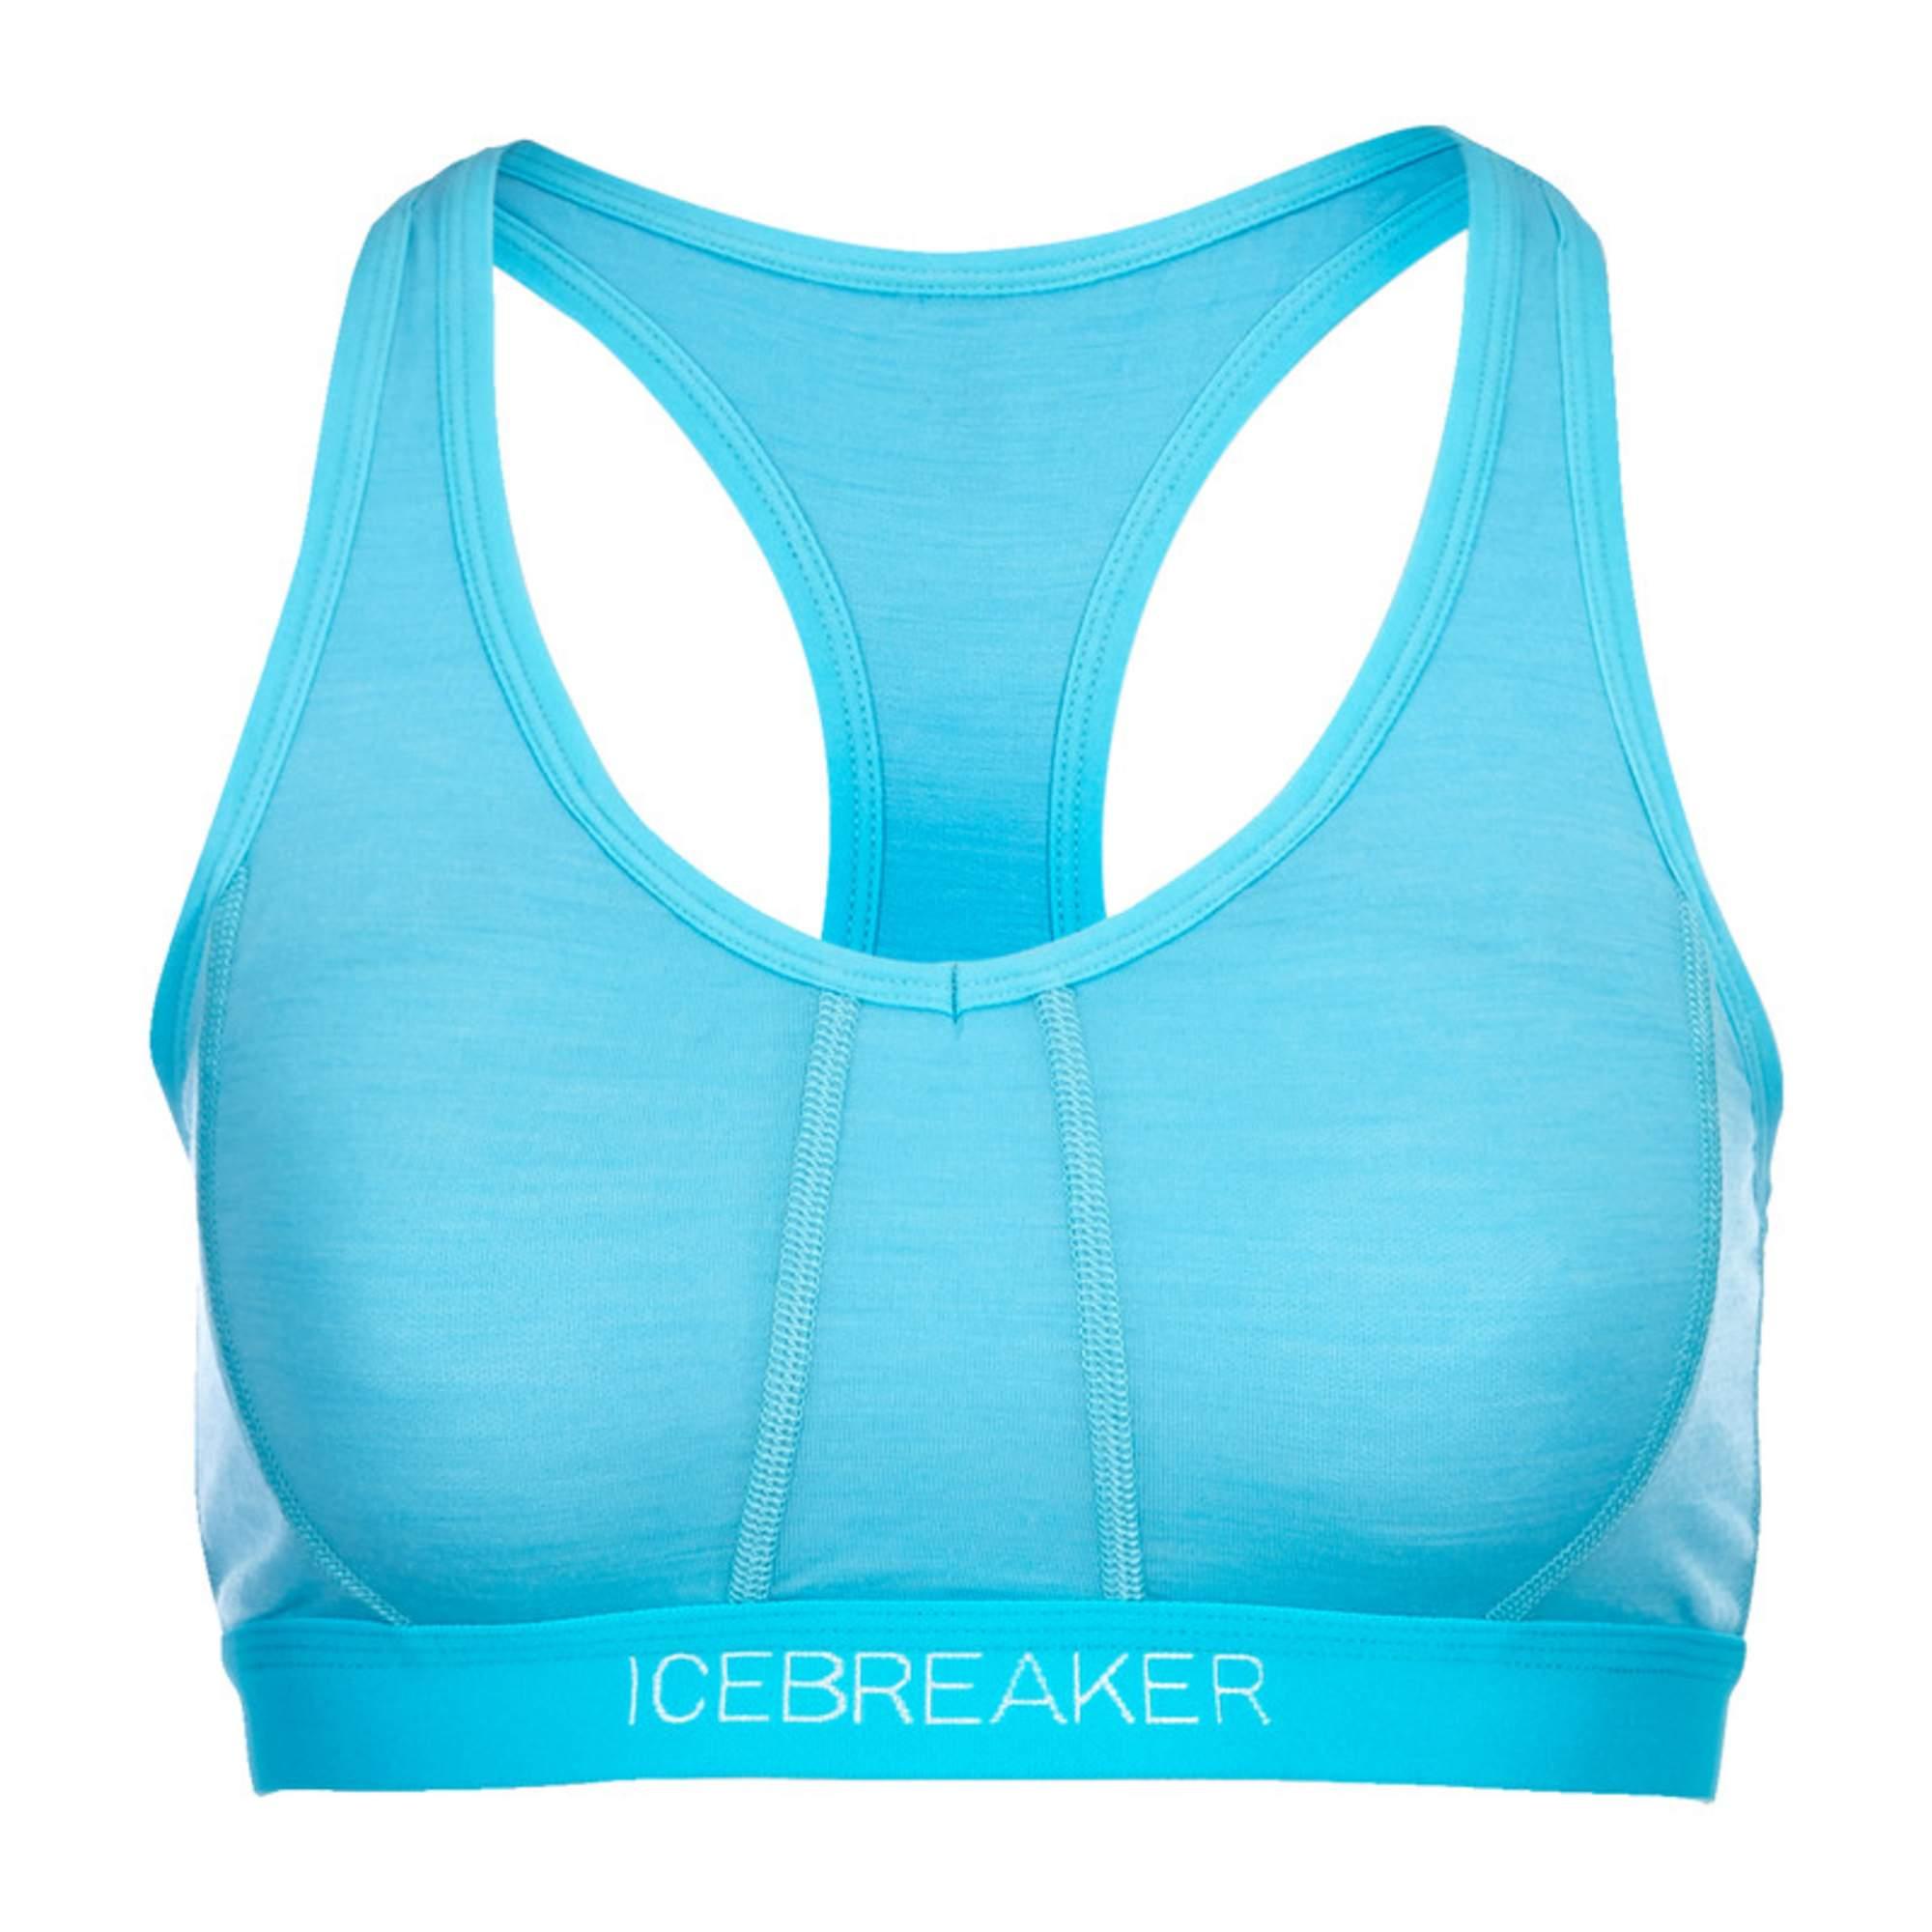 Icebreaker Sprite Racerback Bra 150 Frauen Gr. XL - Sport BH - blau